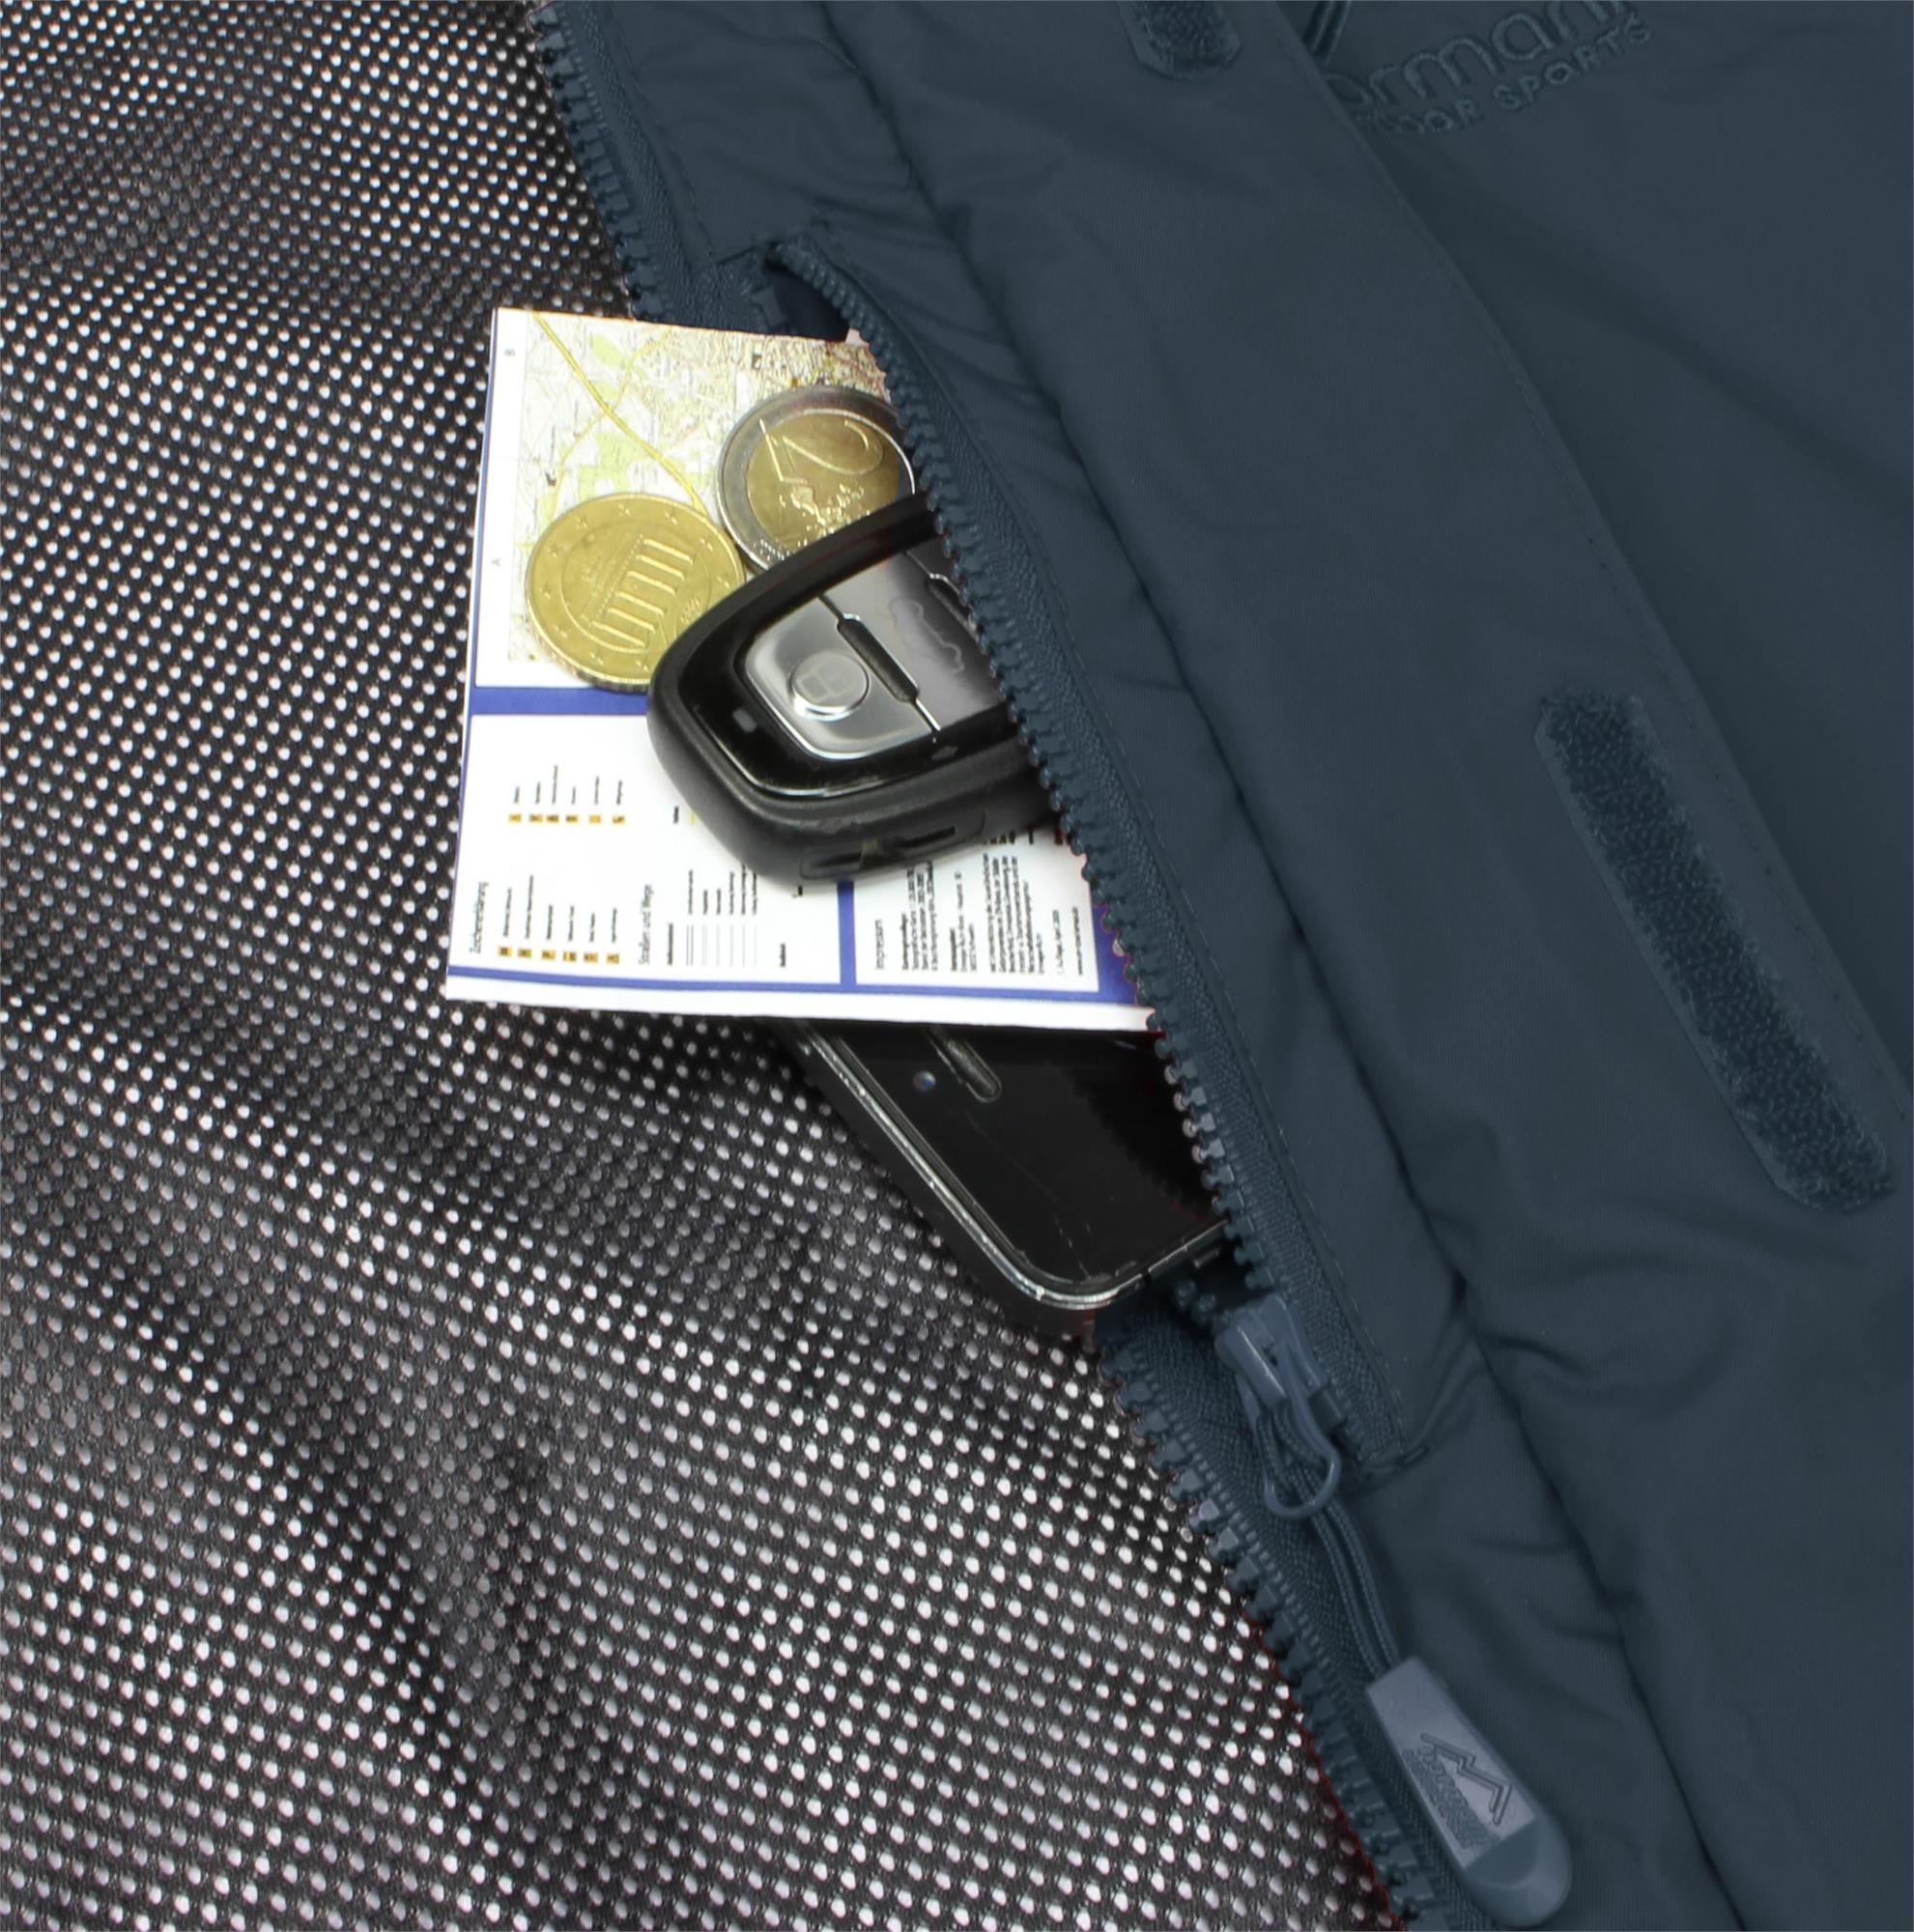 Indexbild 25 - Damen-Jacke Hardshelljacke Übergangs-Regenjacke mit Kapuze Wassersäule 10.000mm